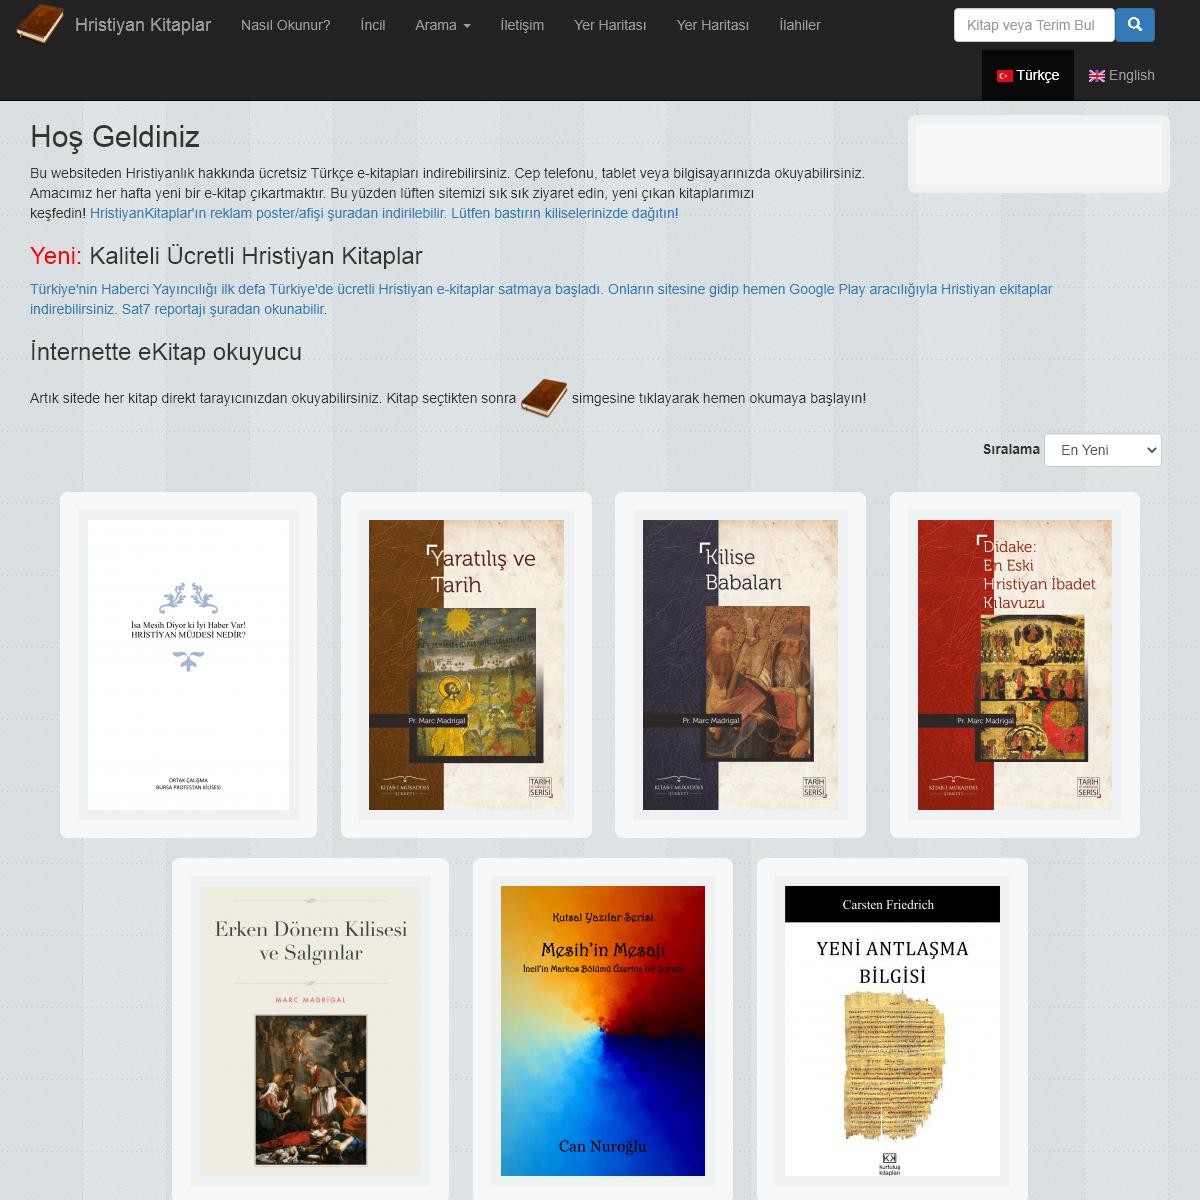 Hristiyan Kitaplar -